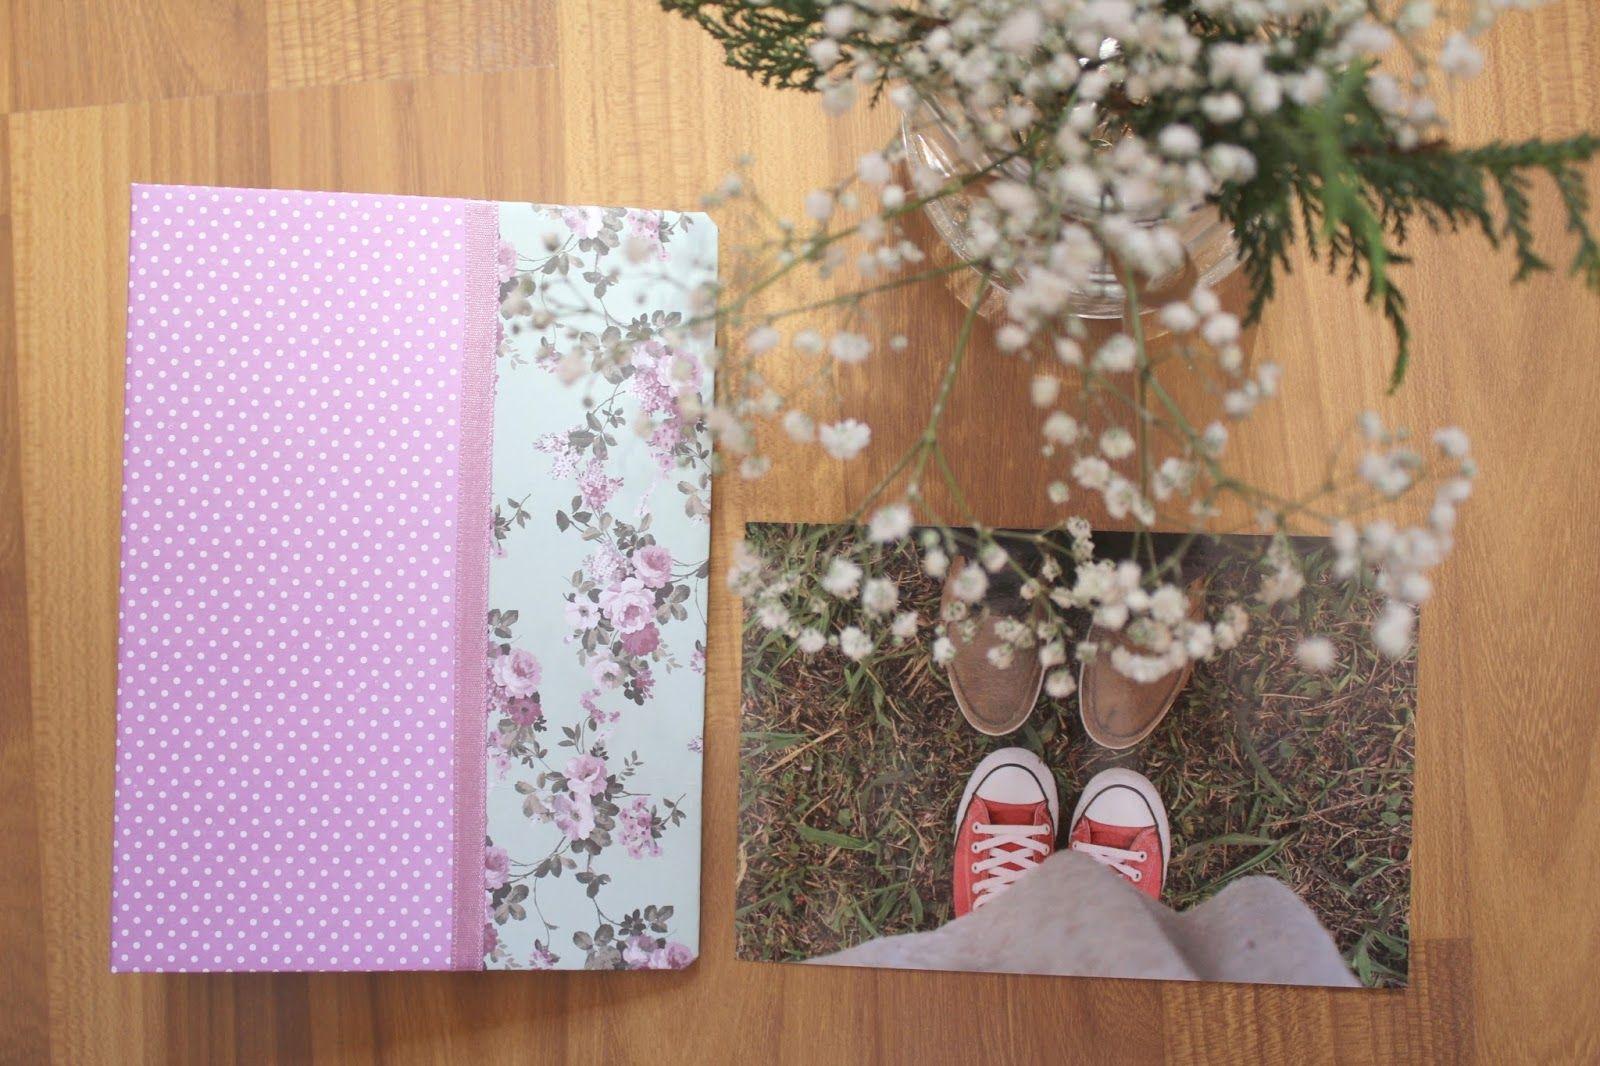 DIY Photo album #DIY #handmade